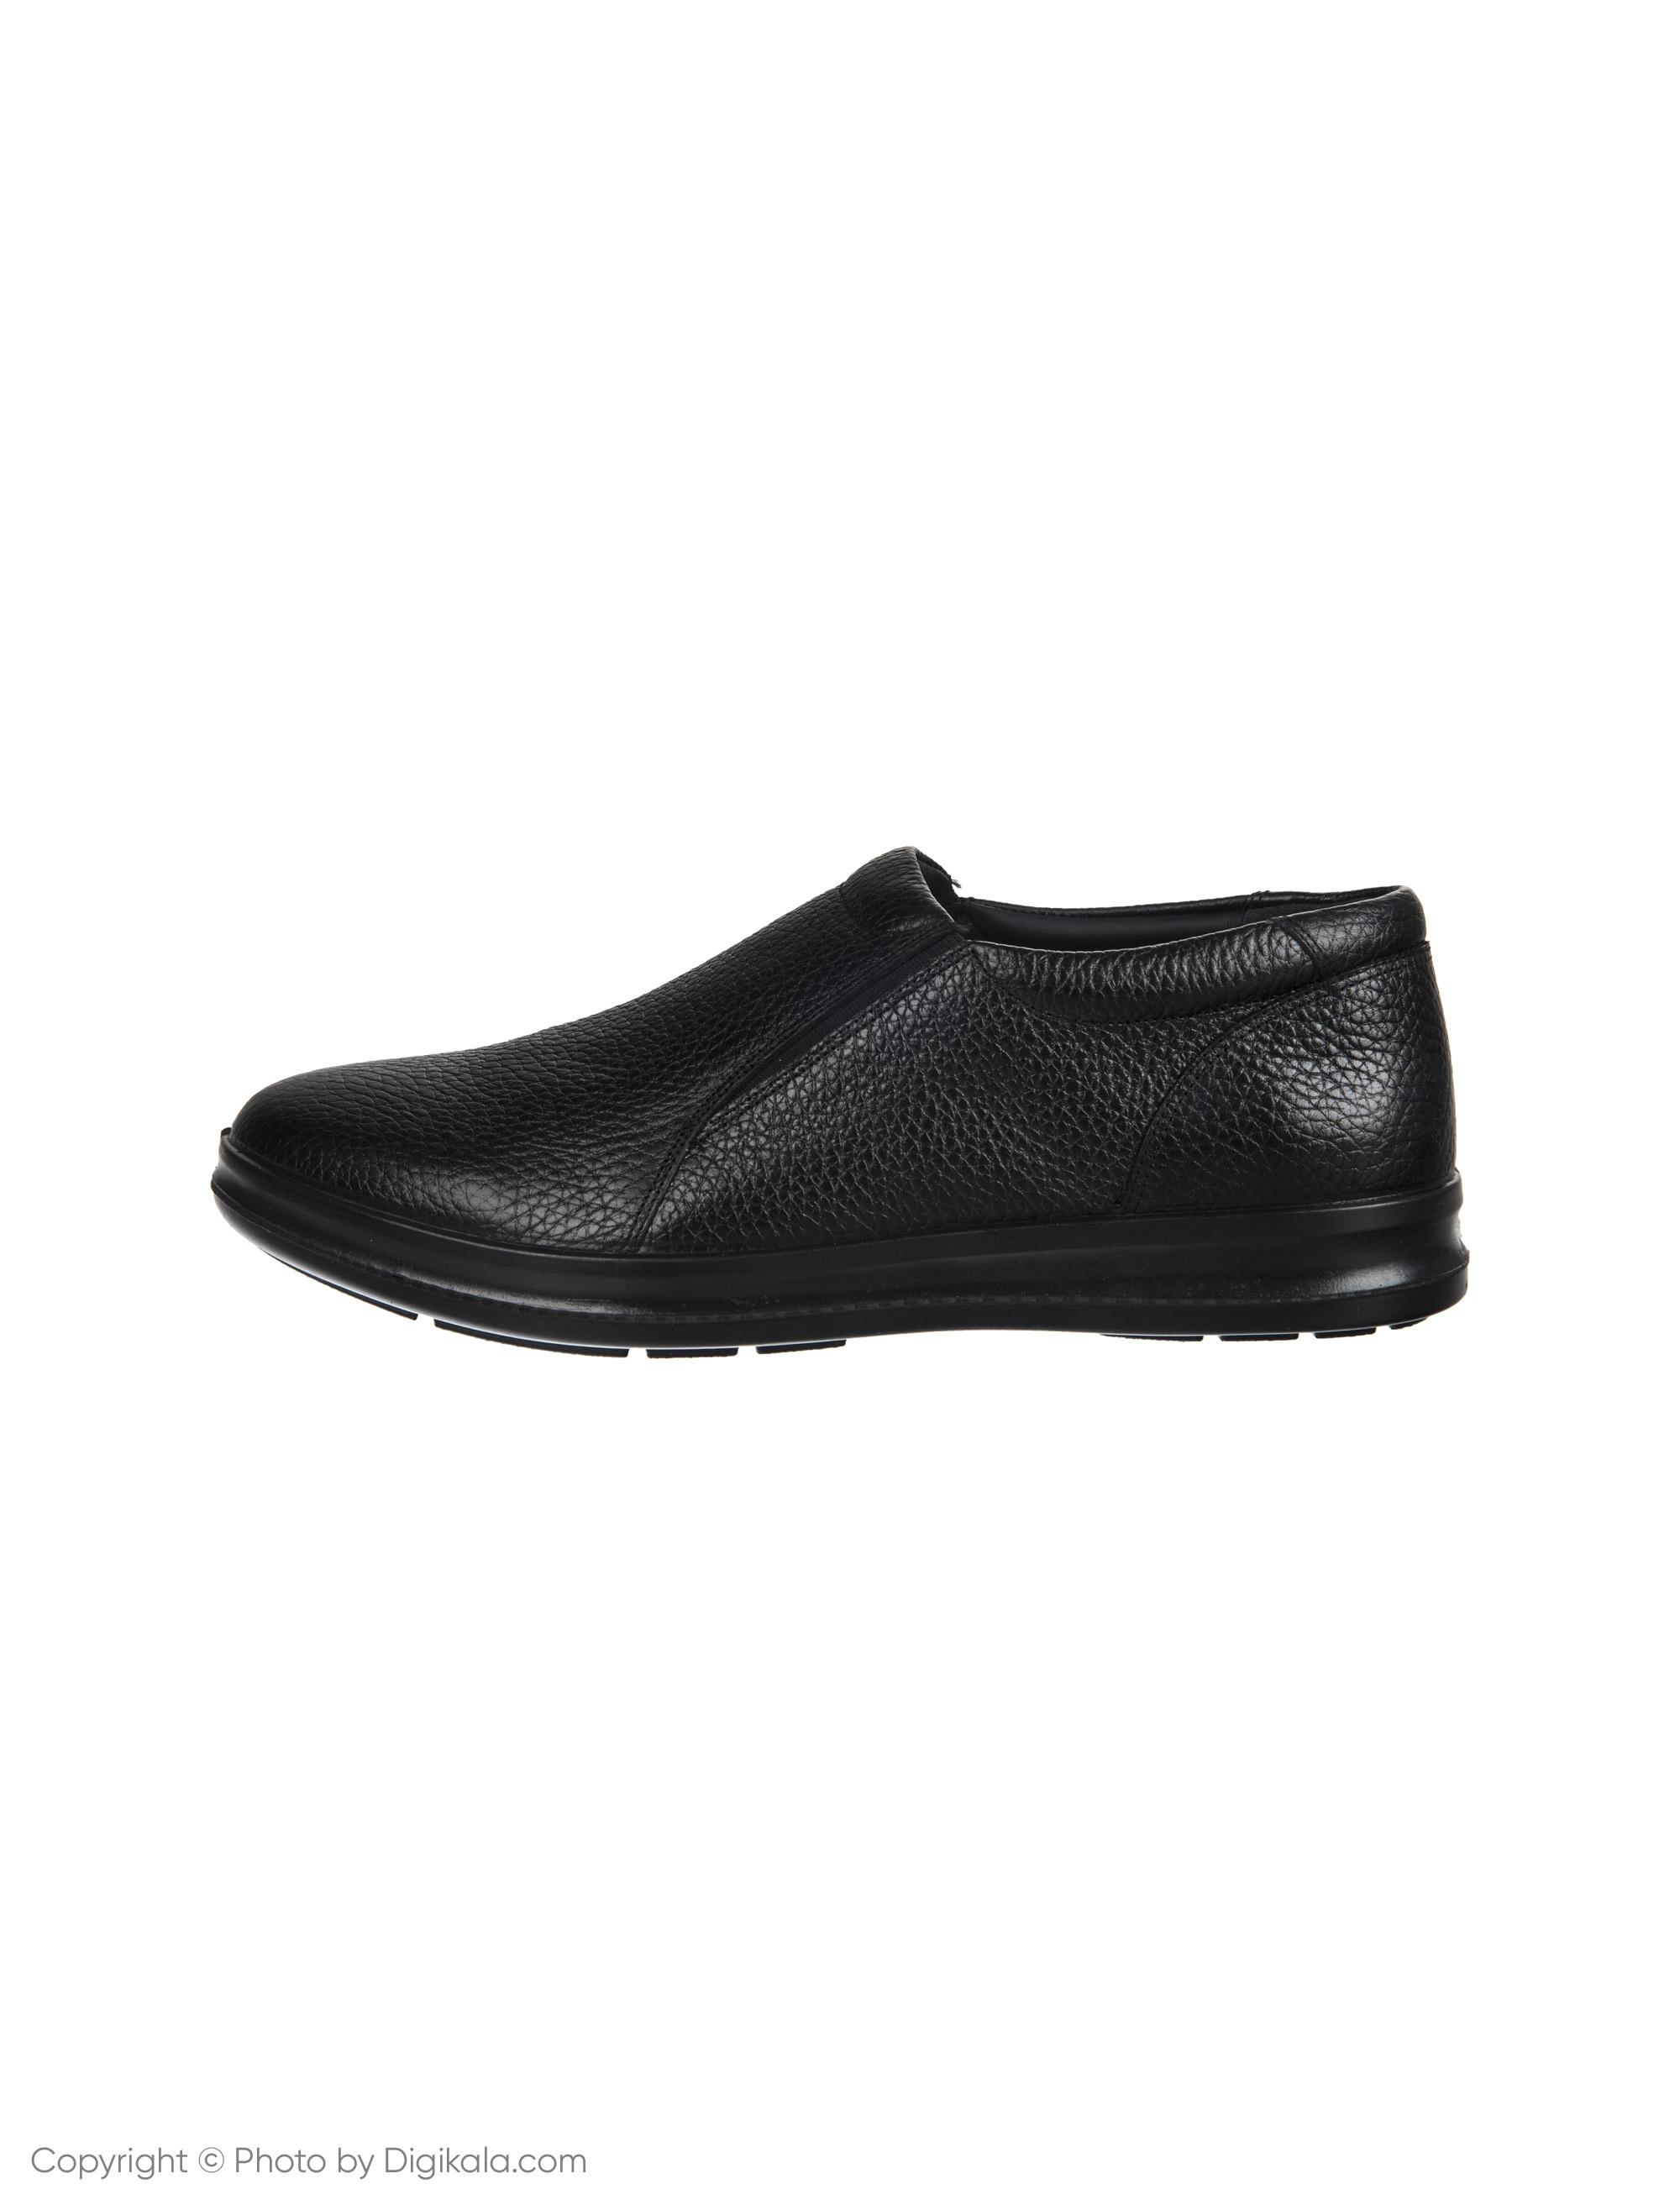 کفش مردانه دنیلی مدل 113110241002 -  - 1